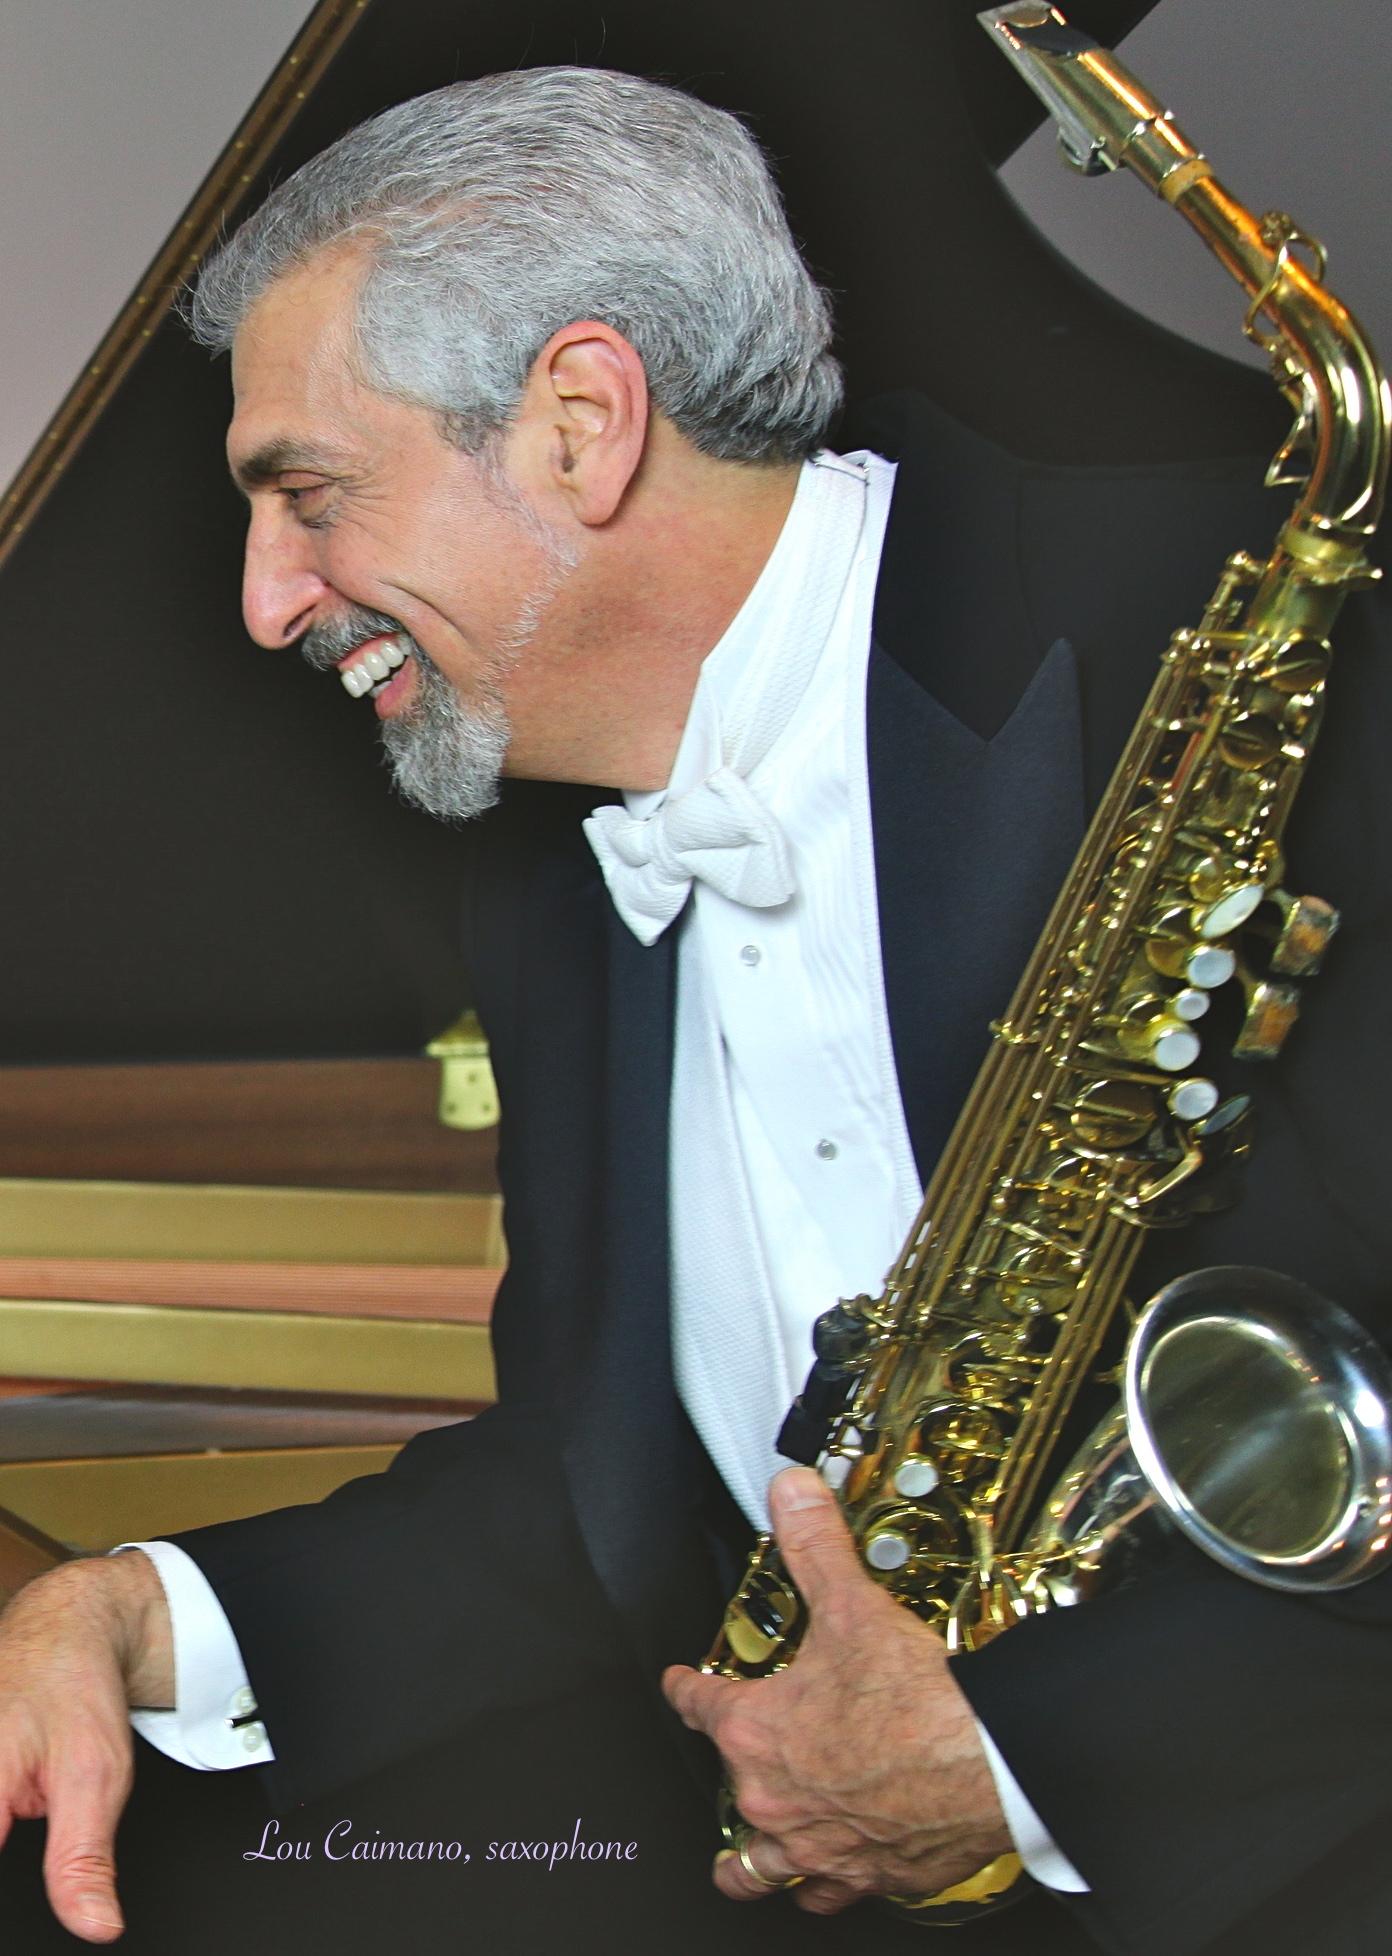 Lou Caimano, saxophone.jpg